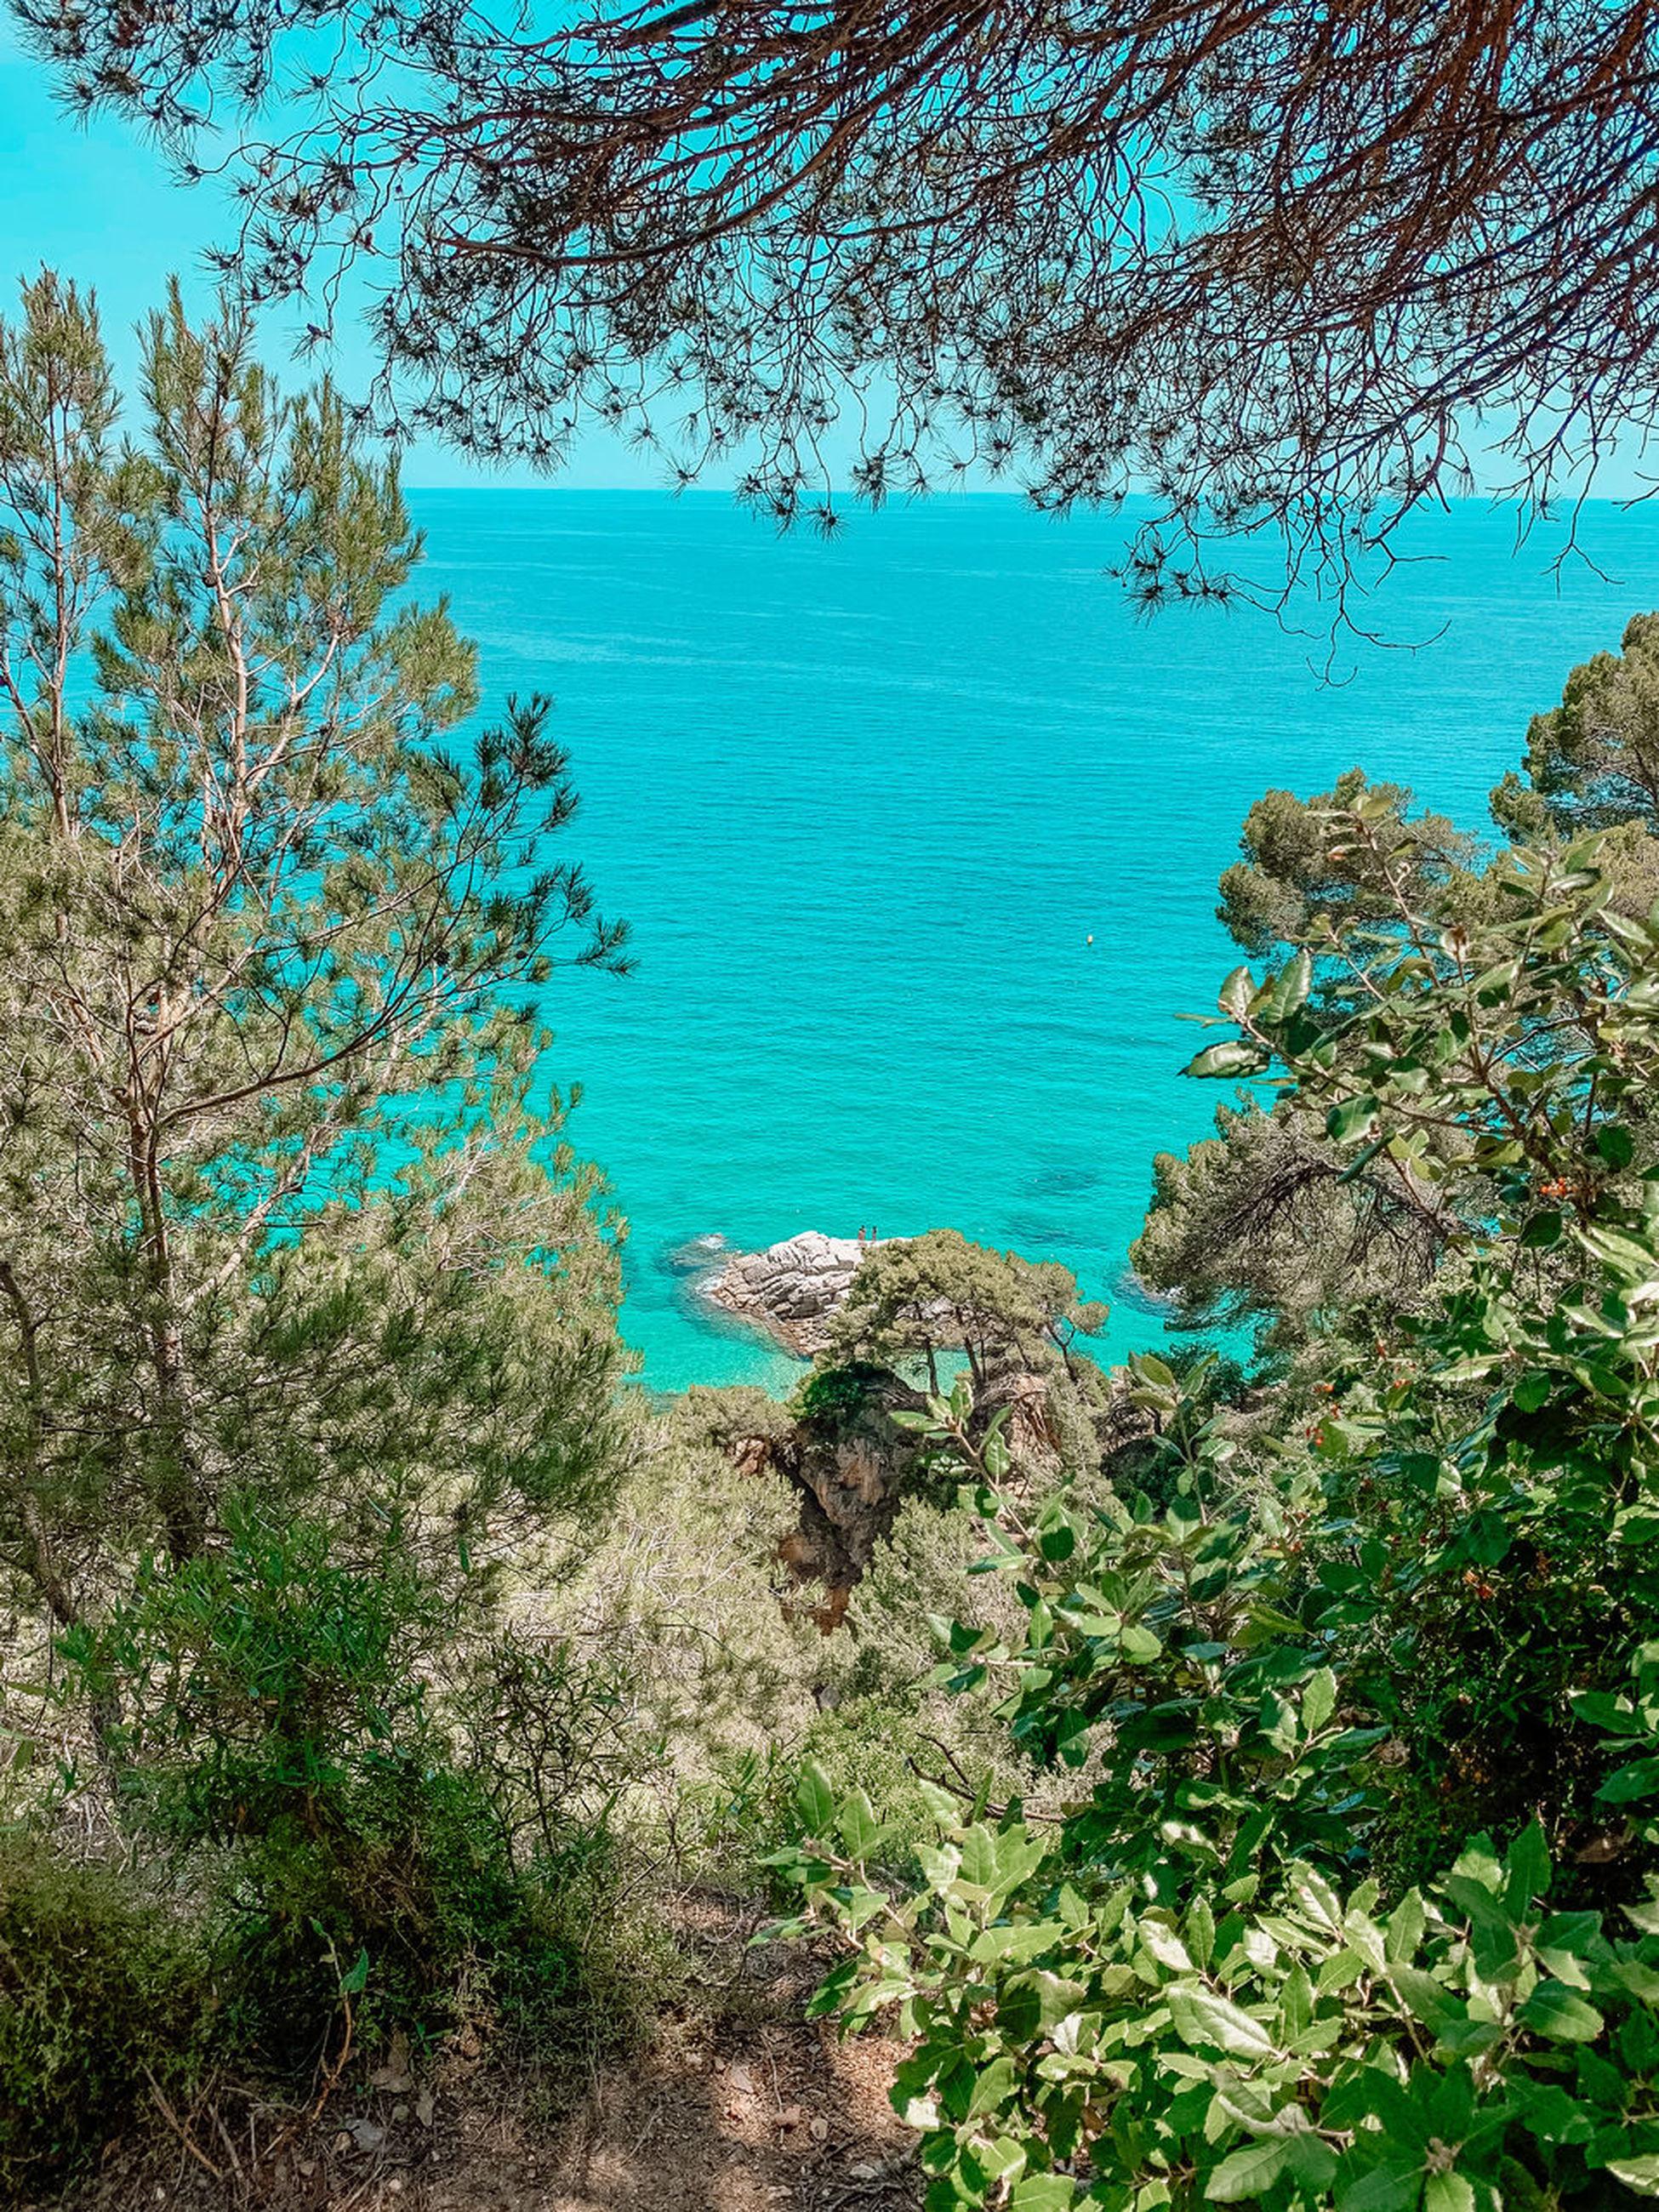 HIGH ANGLE VIEW OF TREES ON SEA